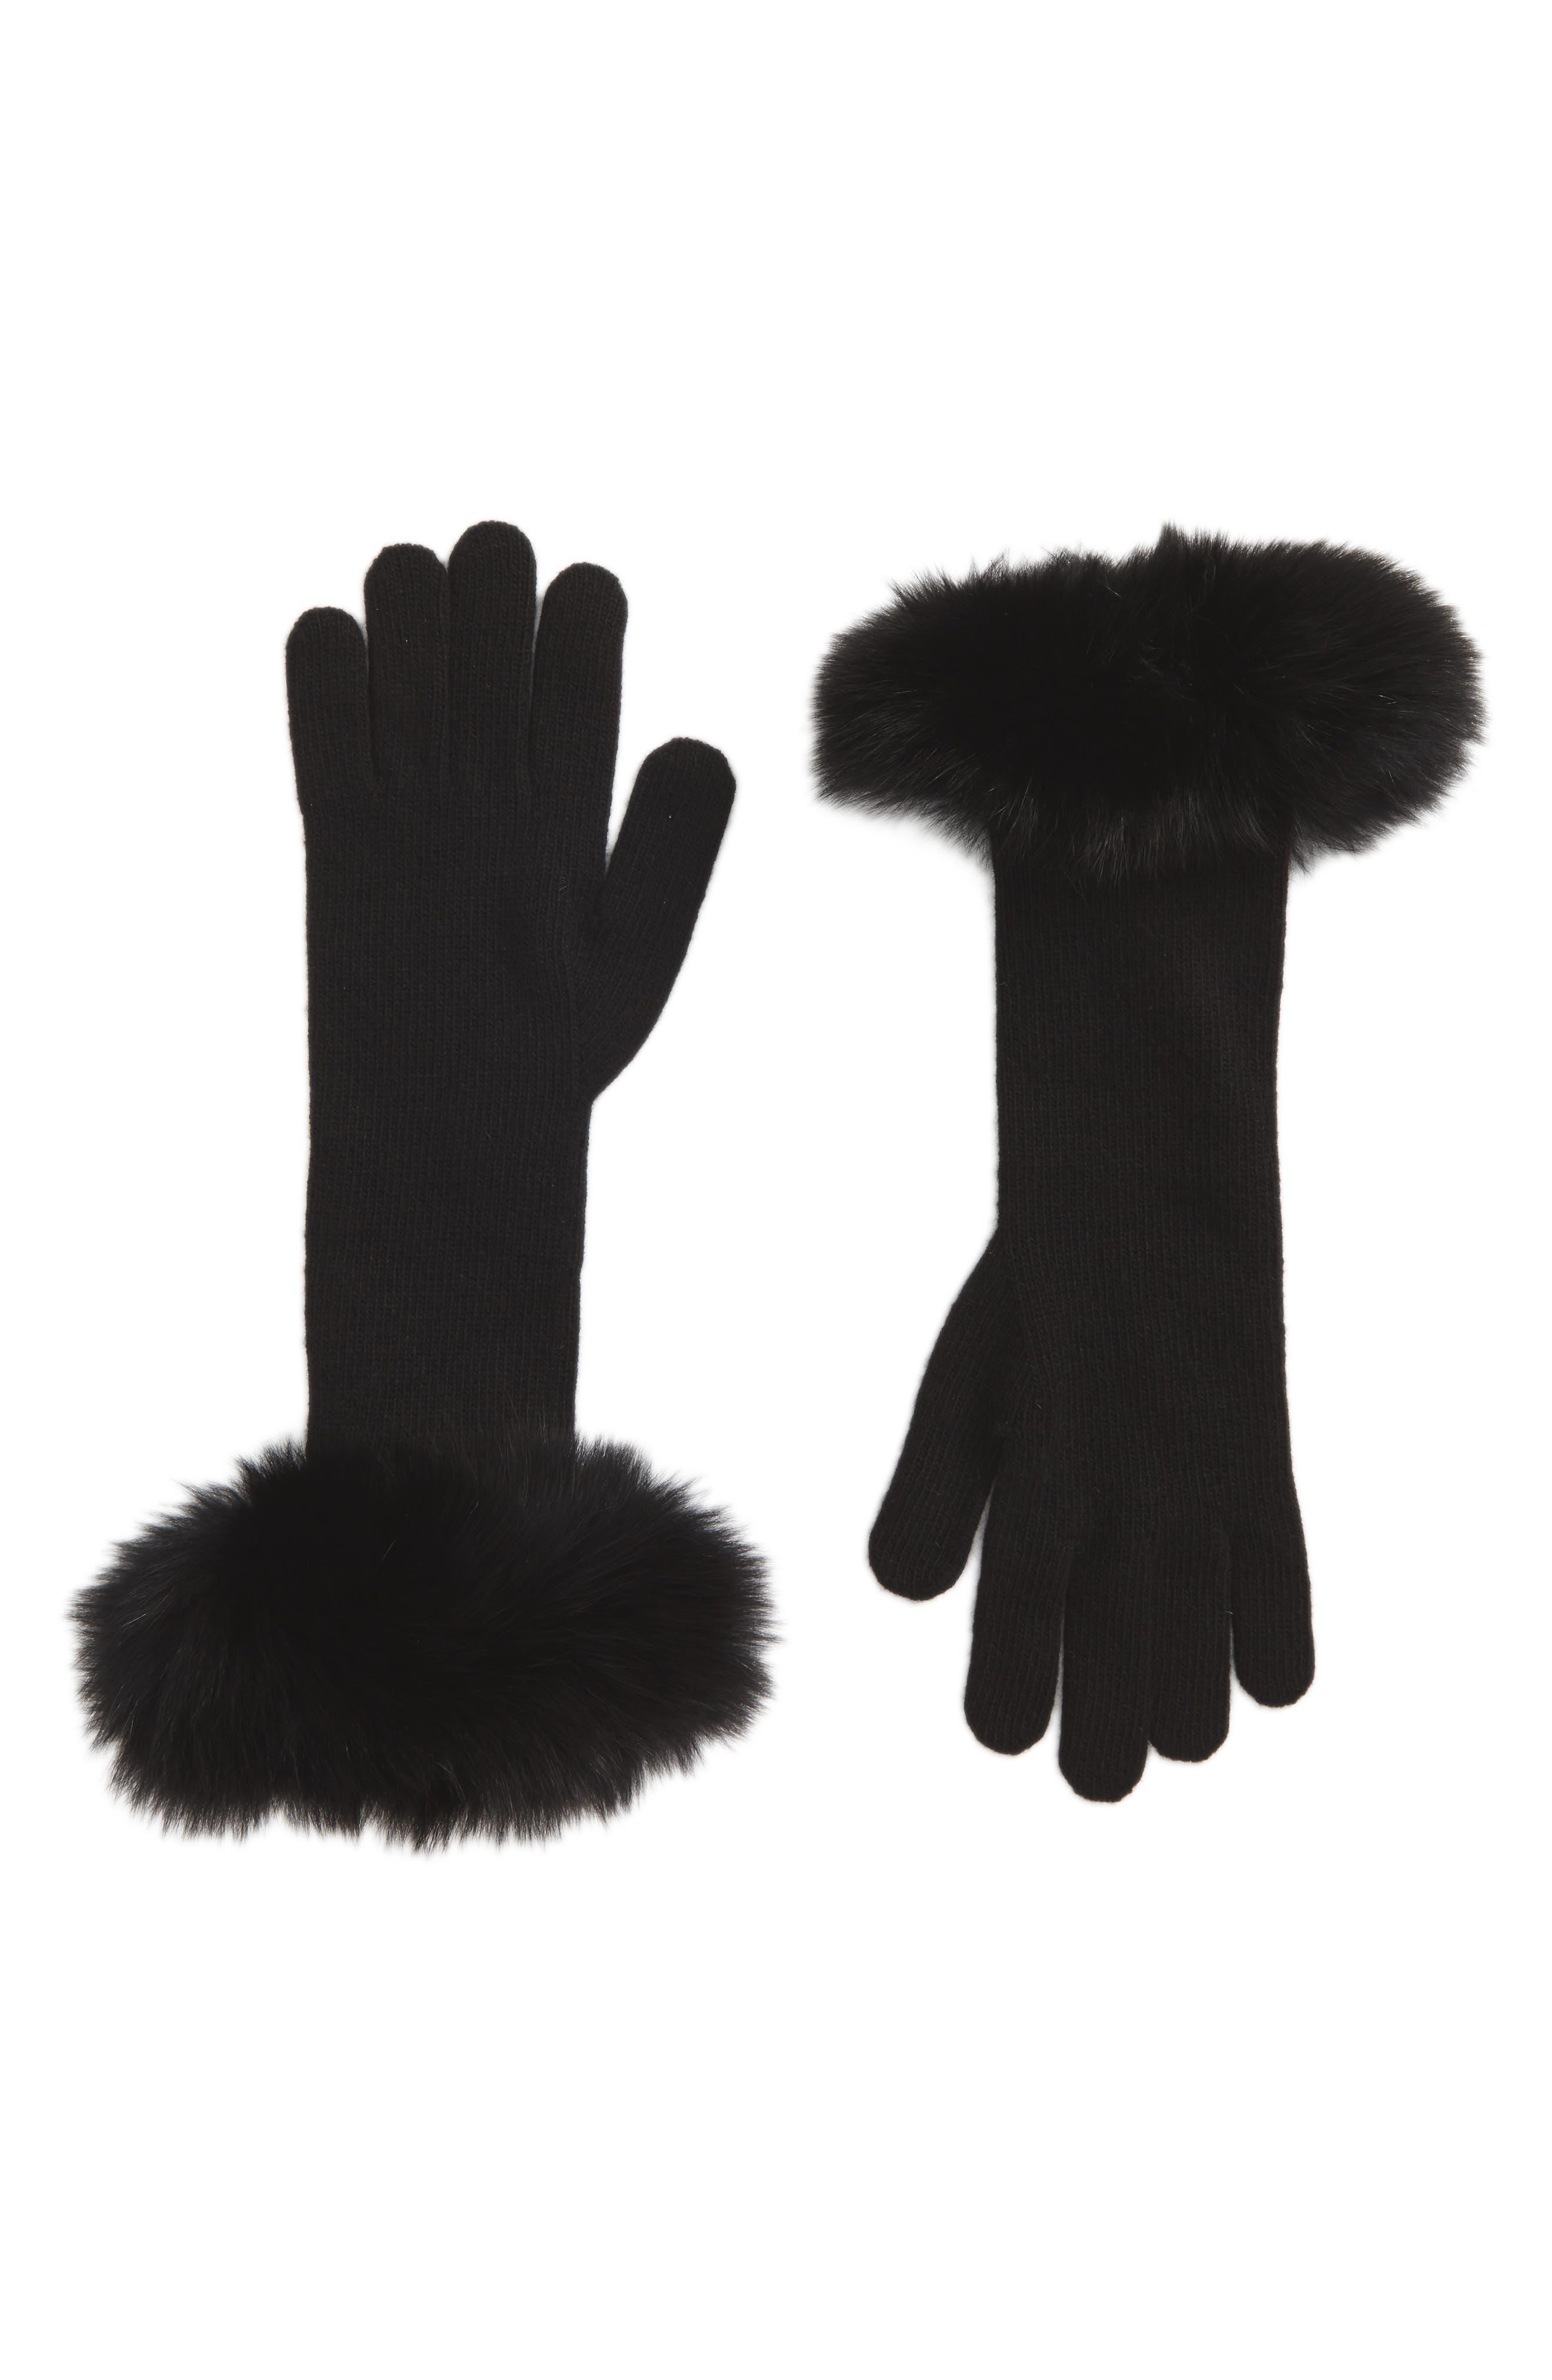 Max Mara Knit Gloves with Genuine Fox Fur Trim